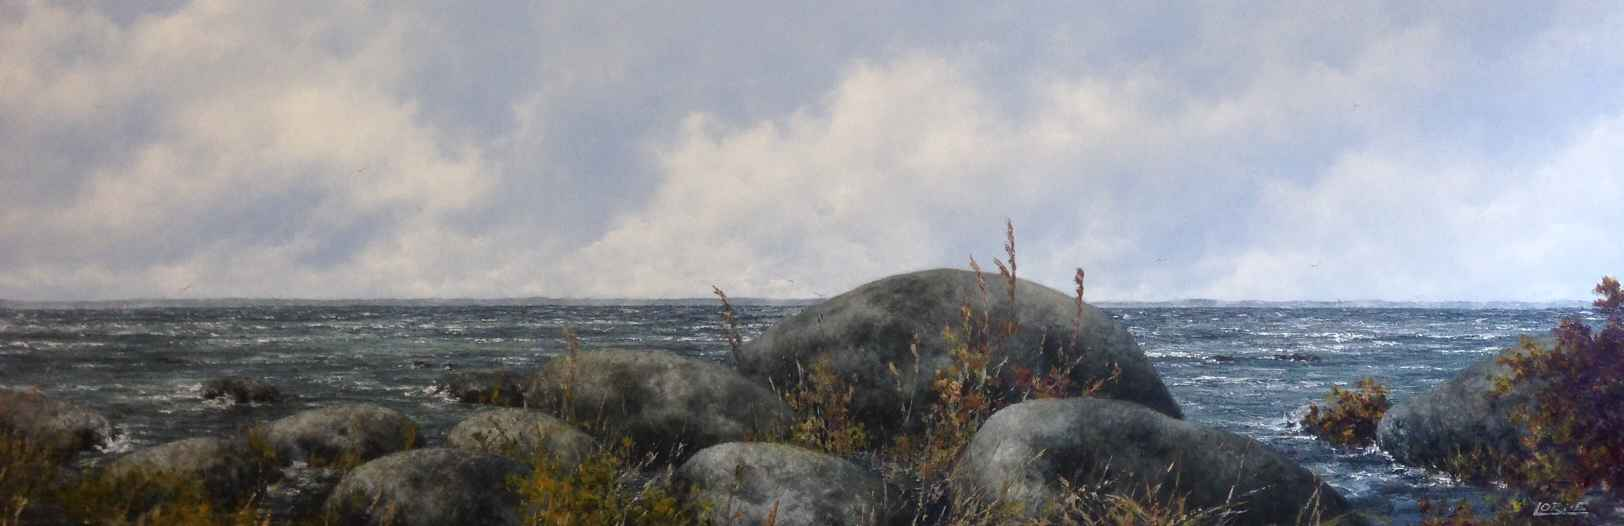 Shore to Shore by Mr. Lorne McDermott - Masterpiece Online